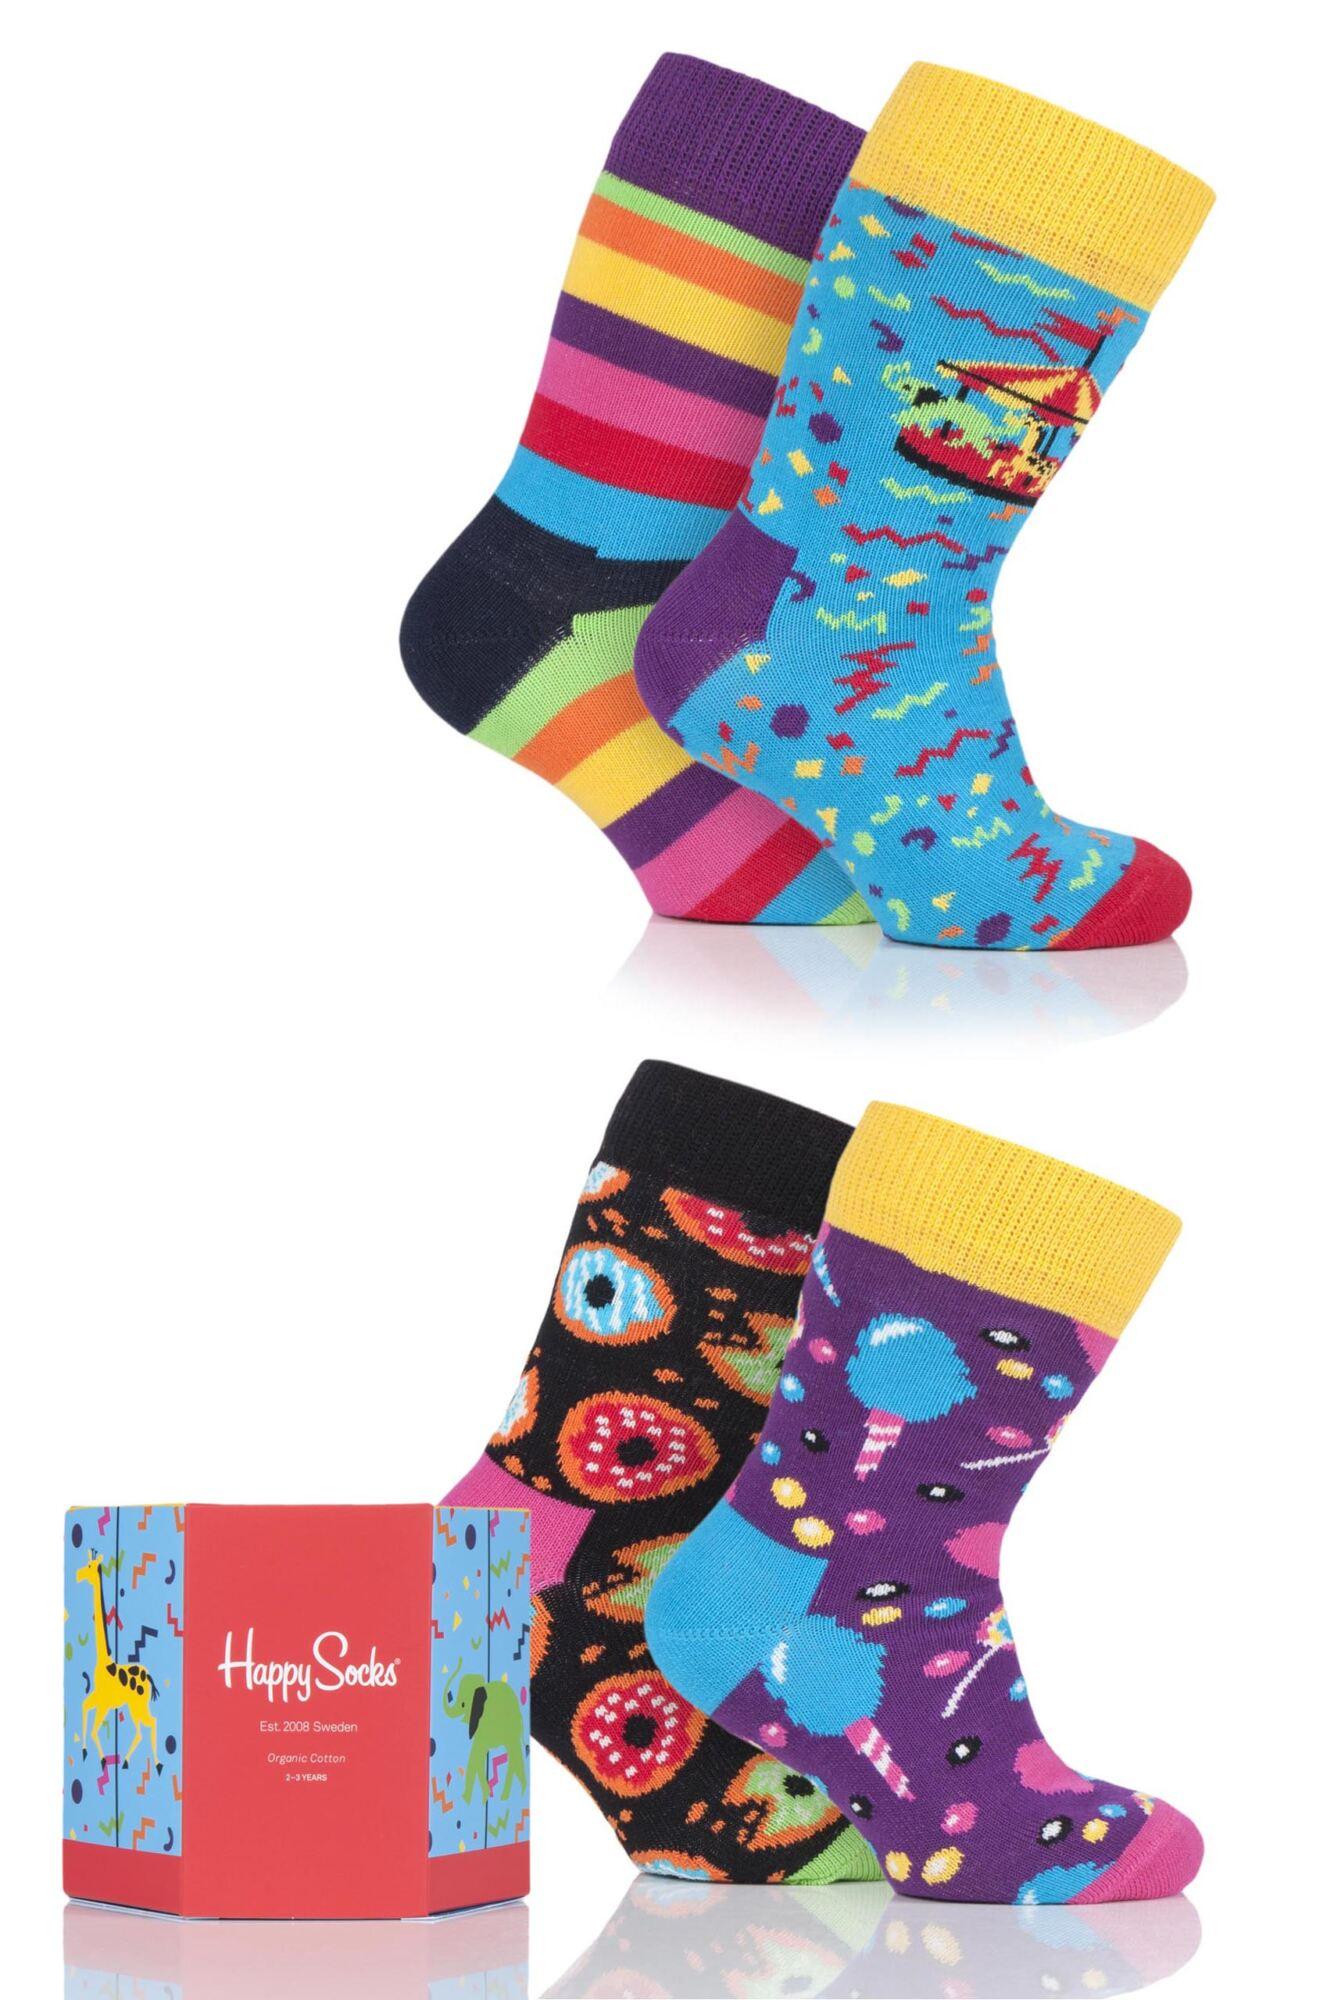 4 Pair Cotton Socks In Carousel Gift Box Kids Unisex - Happy Socks